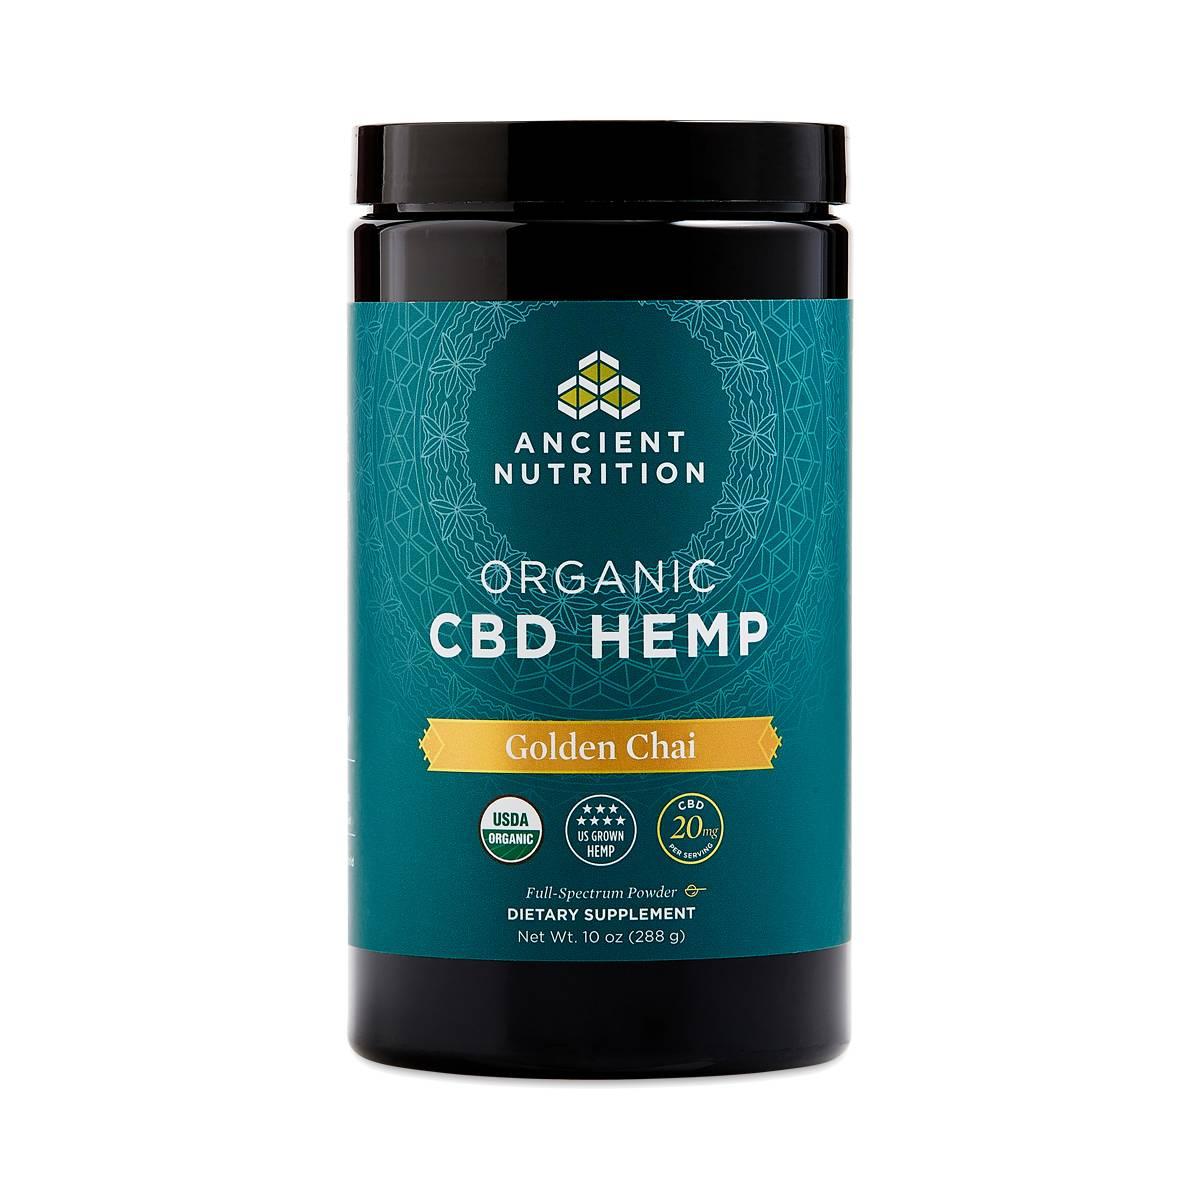 Ancient Nutrition Cbd Hemp Powder  Golden Chai